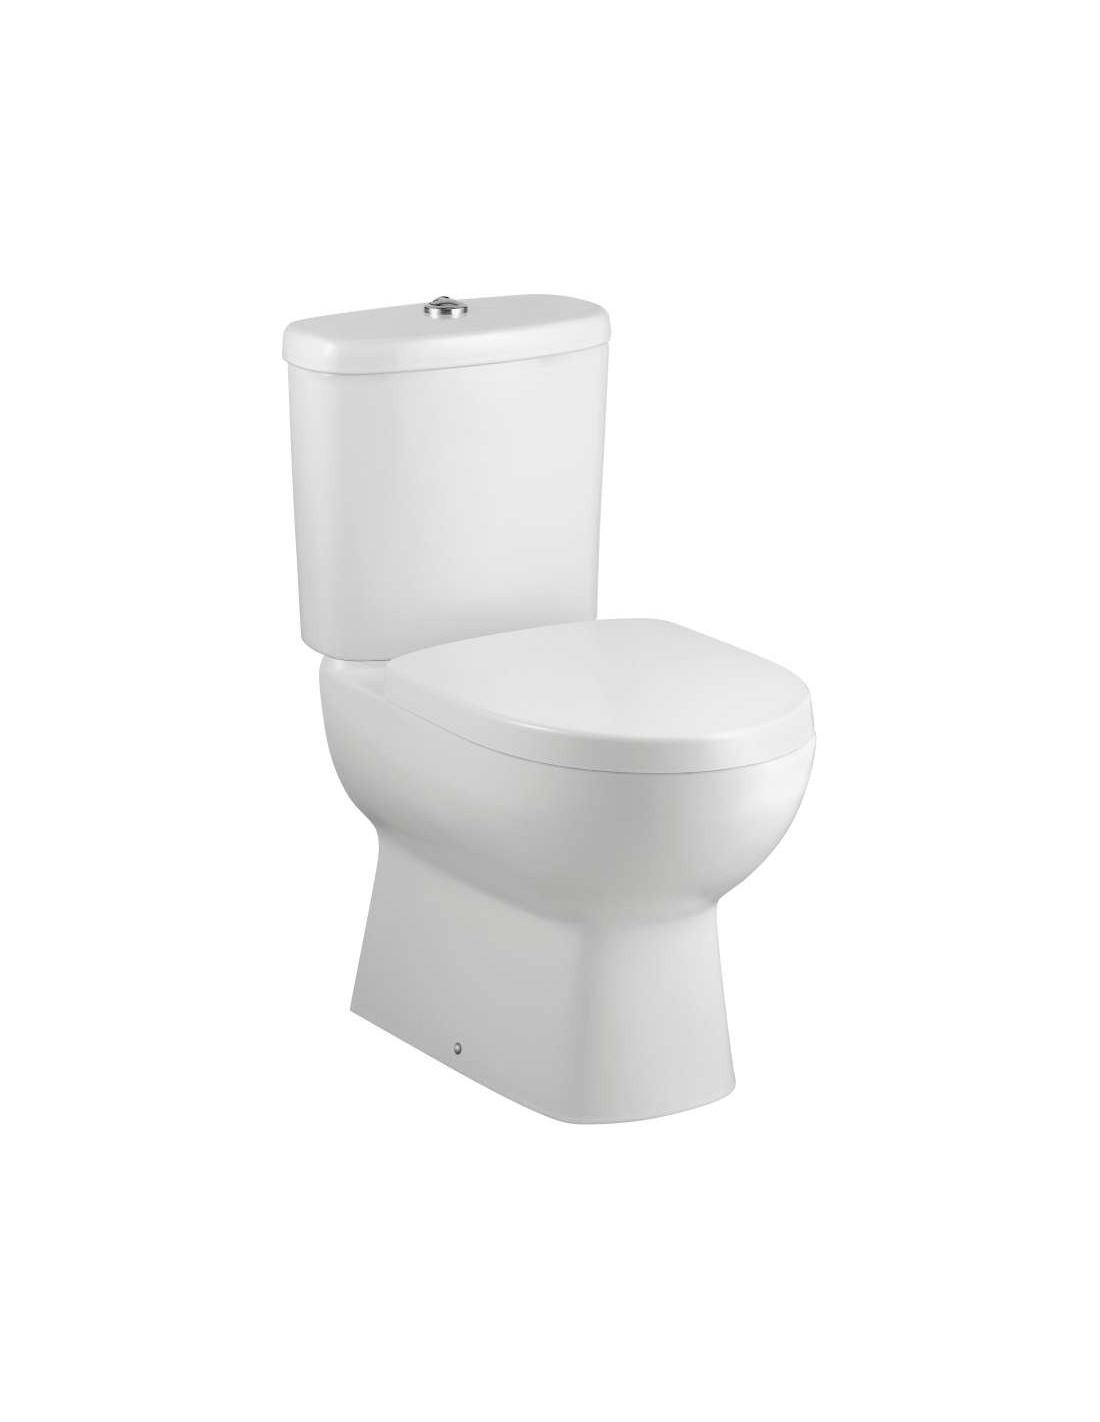 jacob delafon toilet parts 28 images jacob delafon. Black Bedroom Furniture Sets. Home Design Ideas